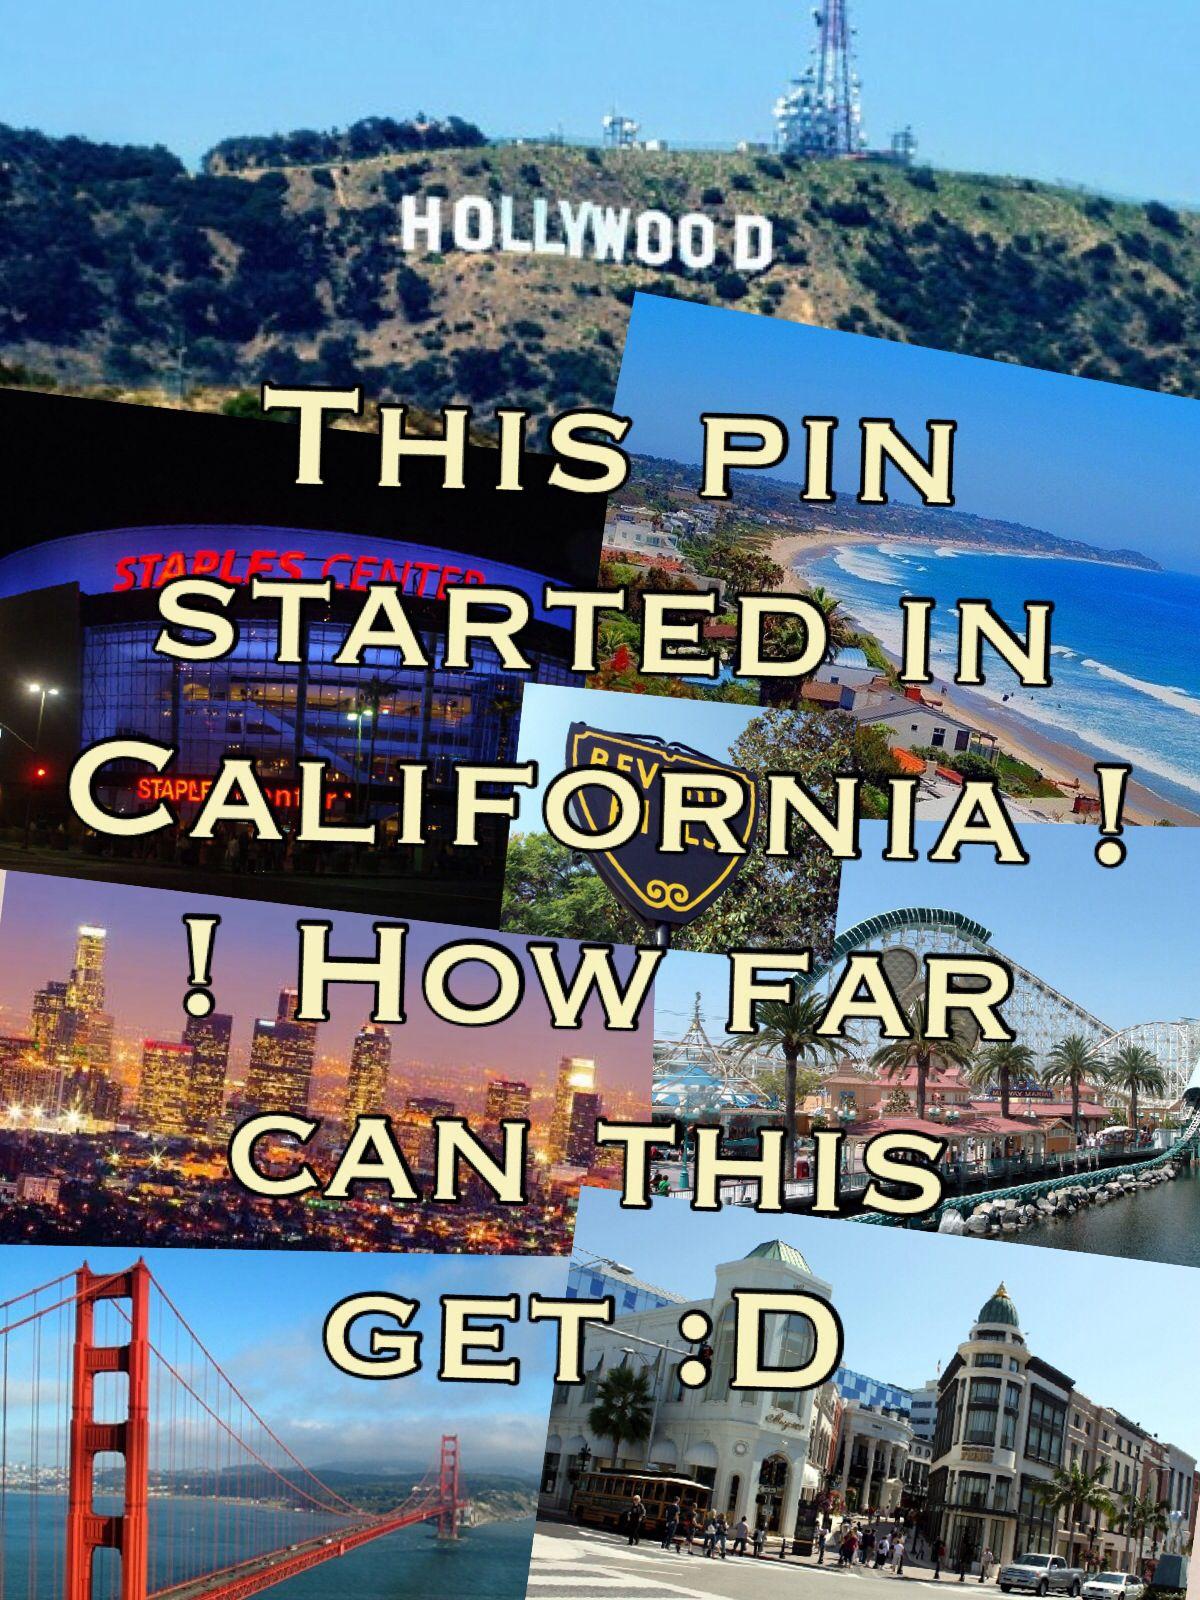 L.A California :D, Wisconsin, Florida :),California!!;), ohio, New York, England:D, Washington, São Paulo-Brazil!;D,